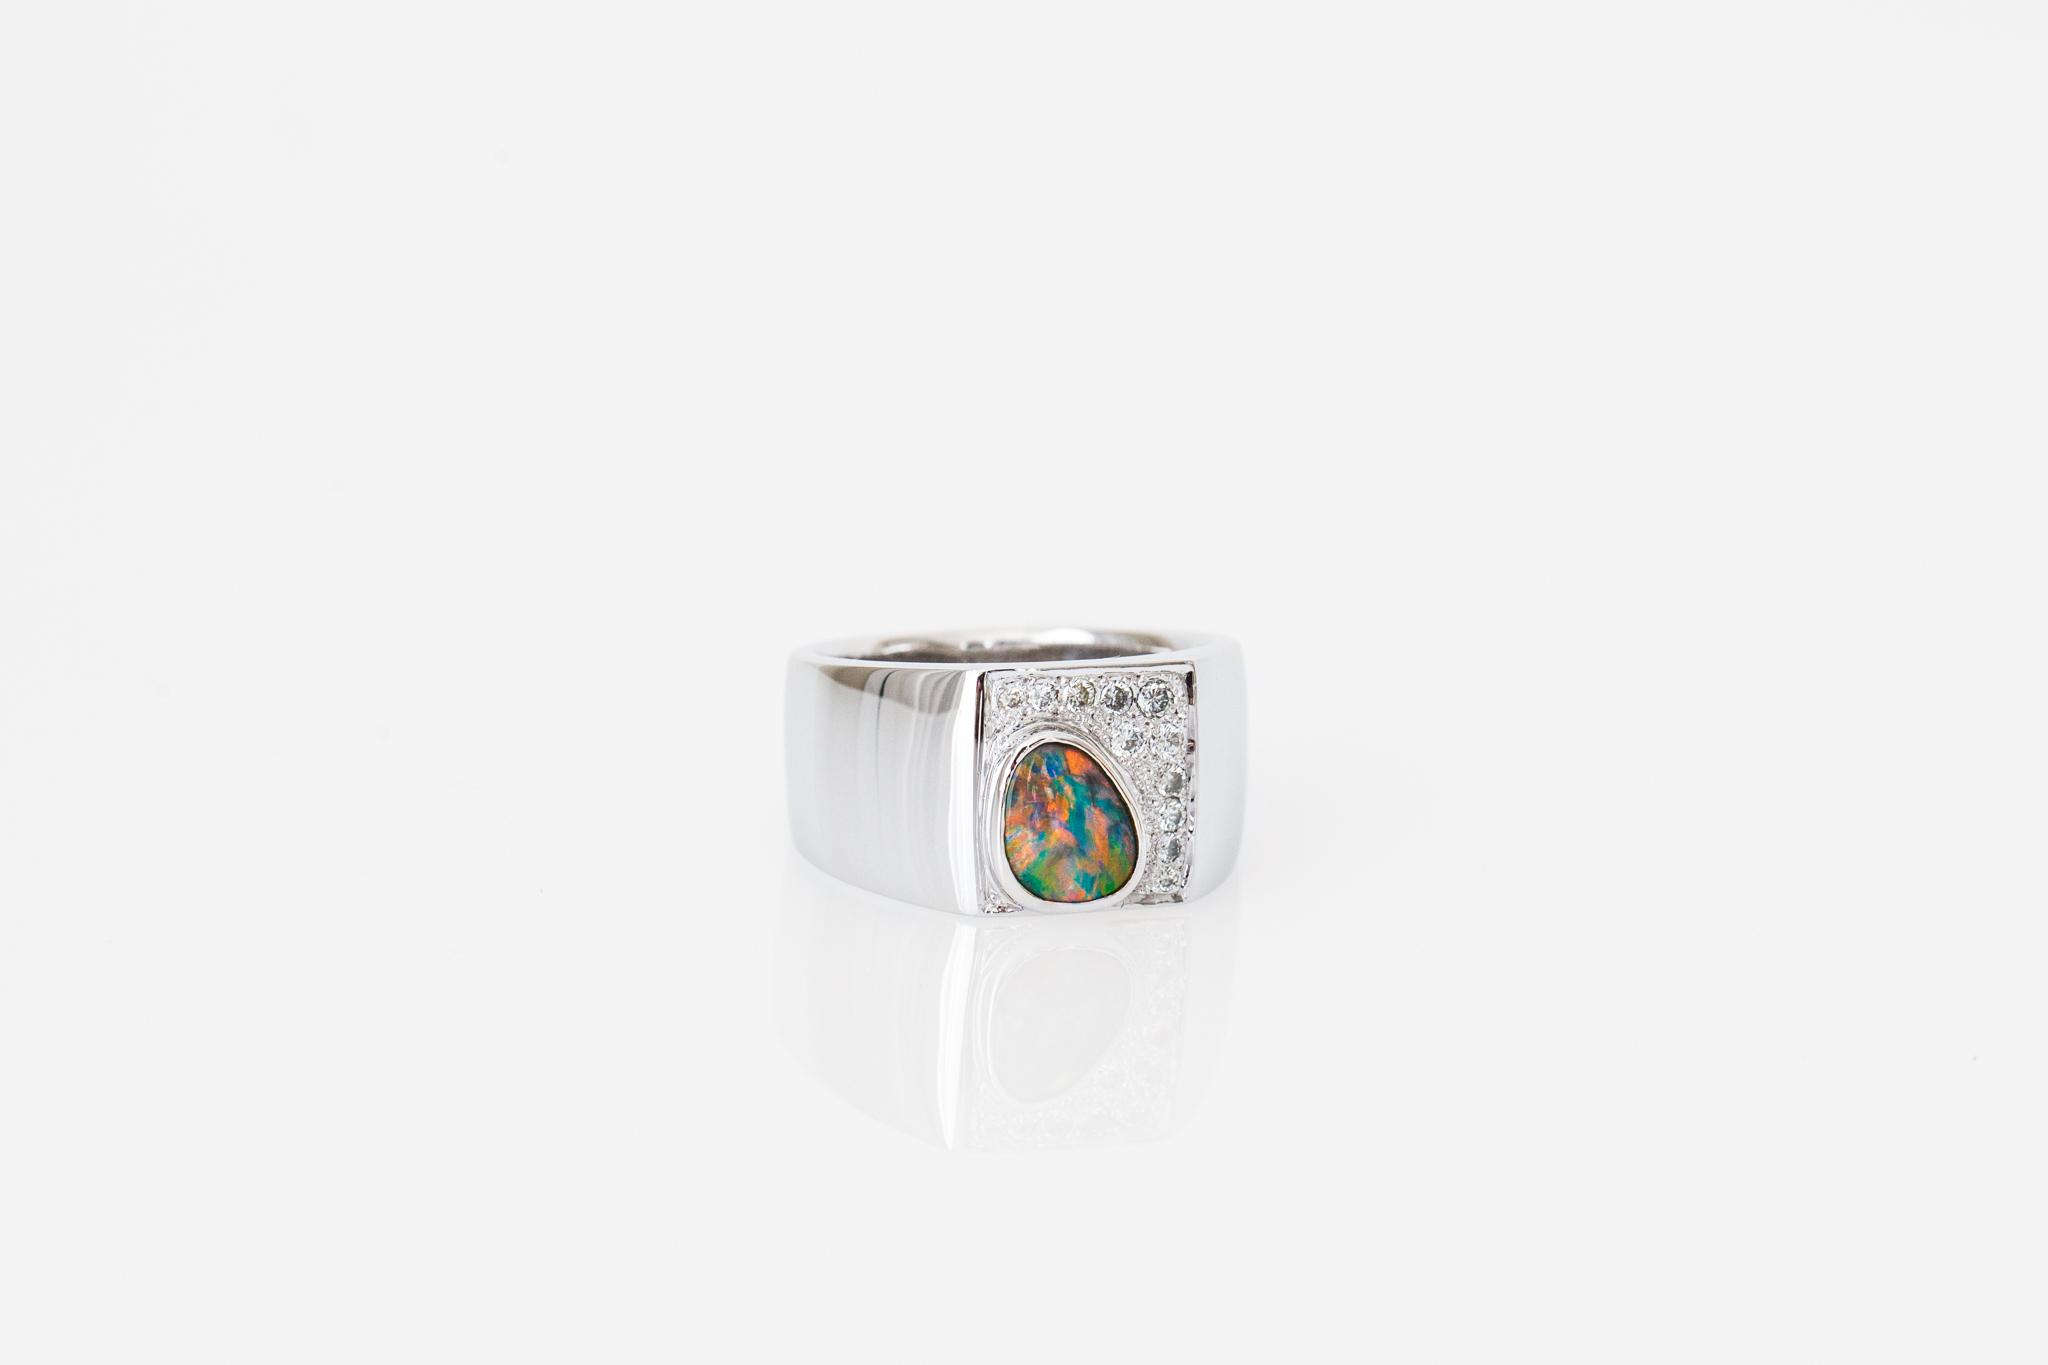 Black opal gents ring - Harlequin Jewellers